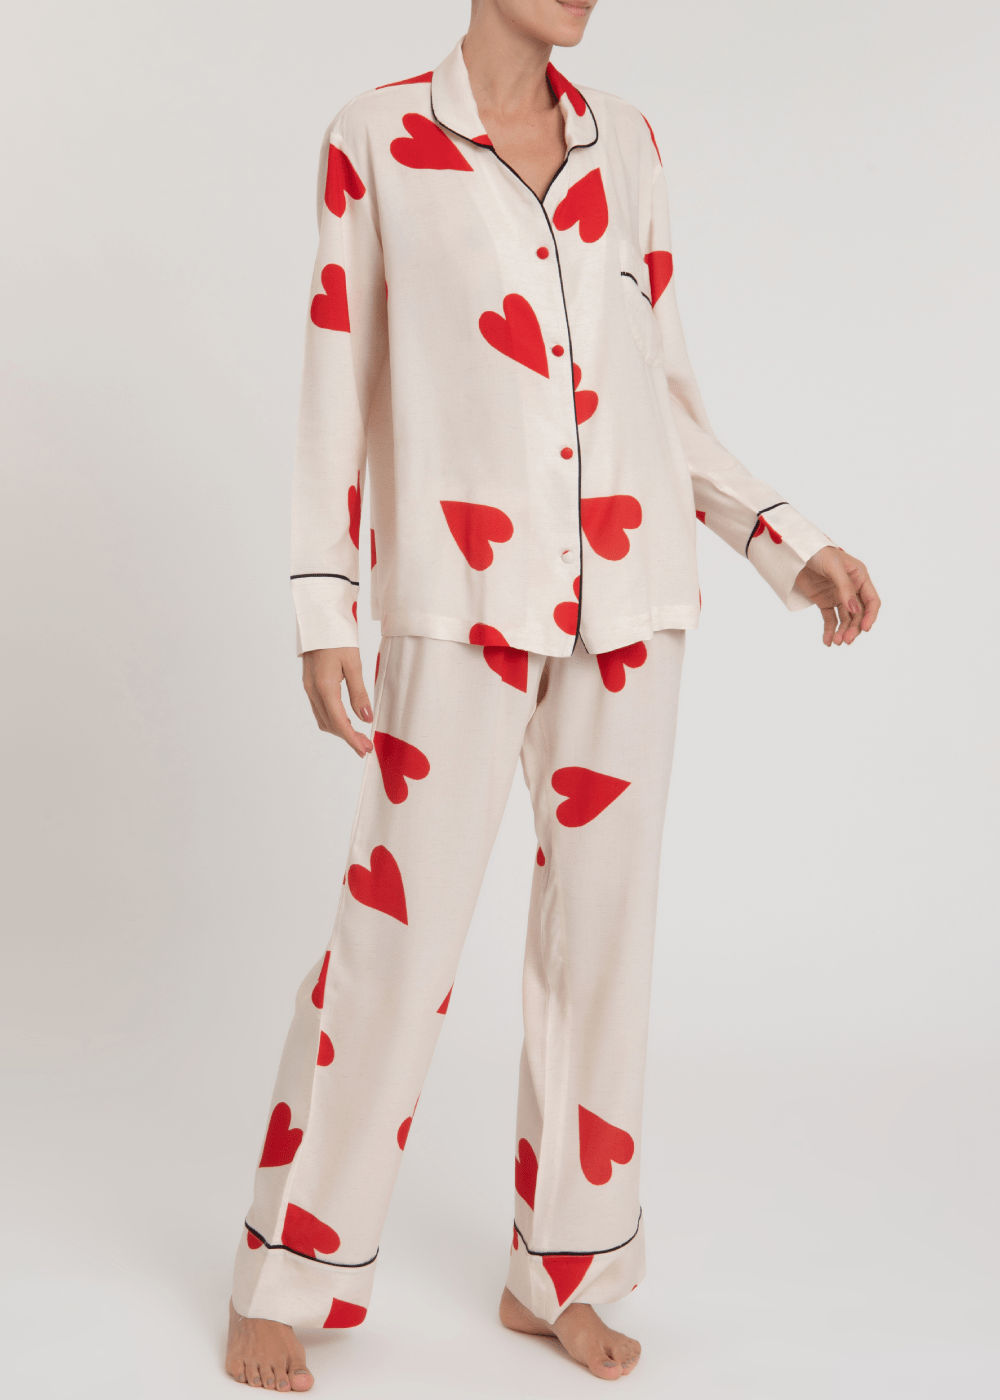 pijamacoracaocalca--2-